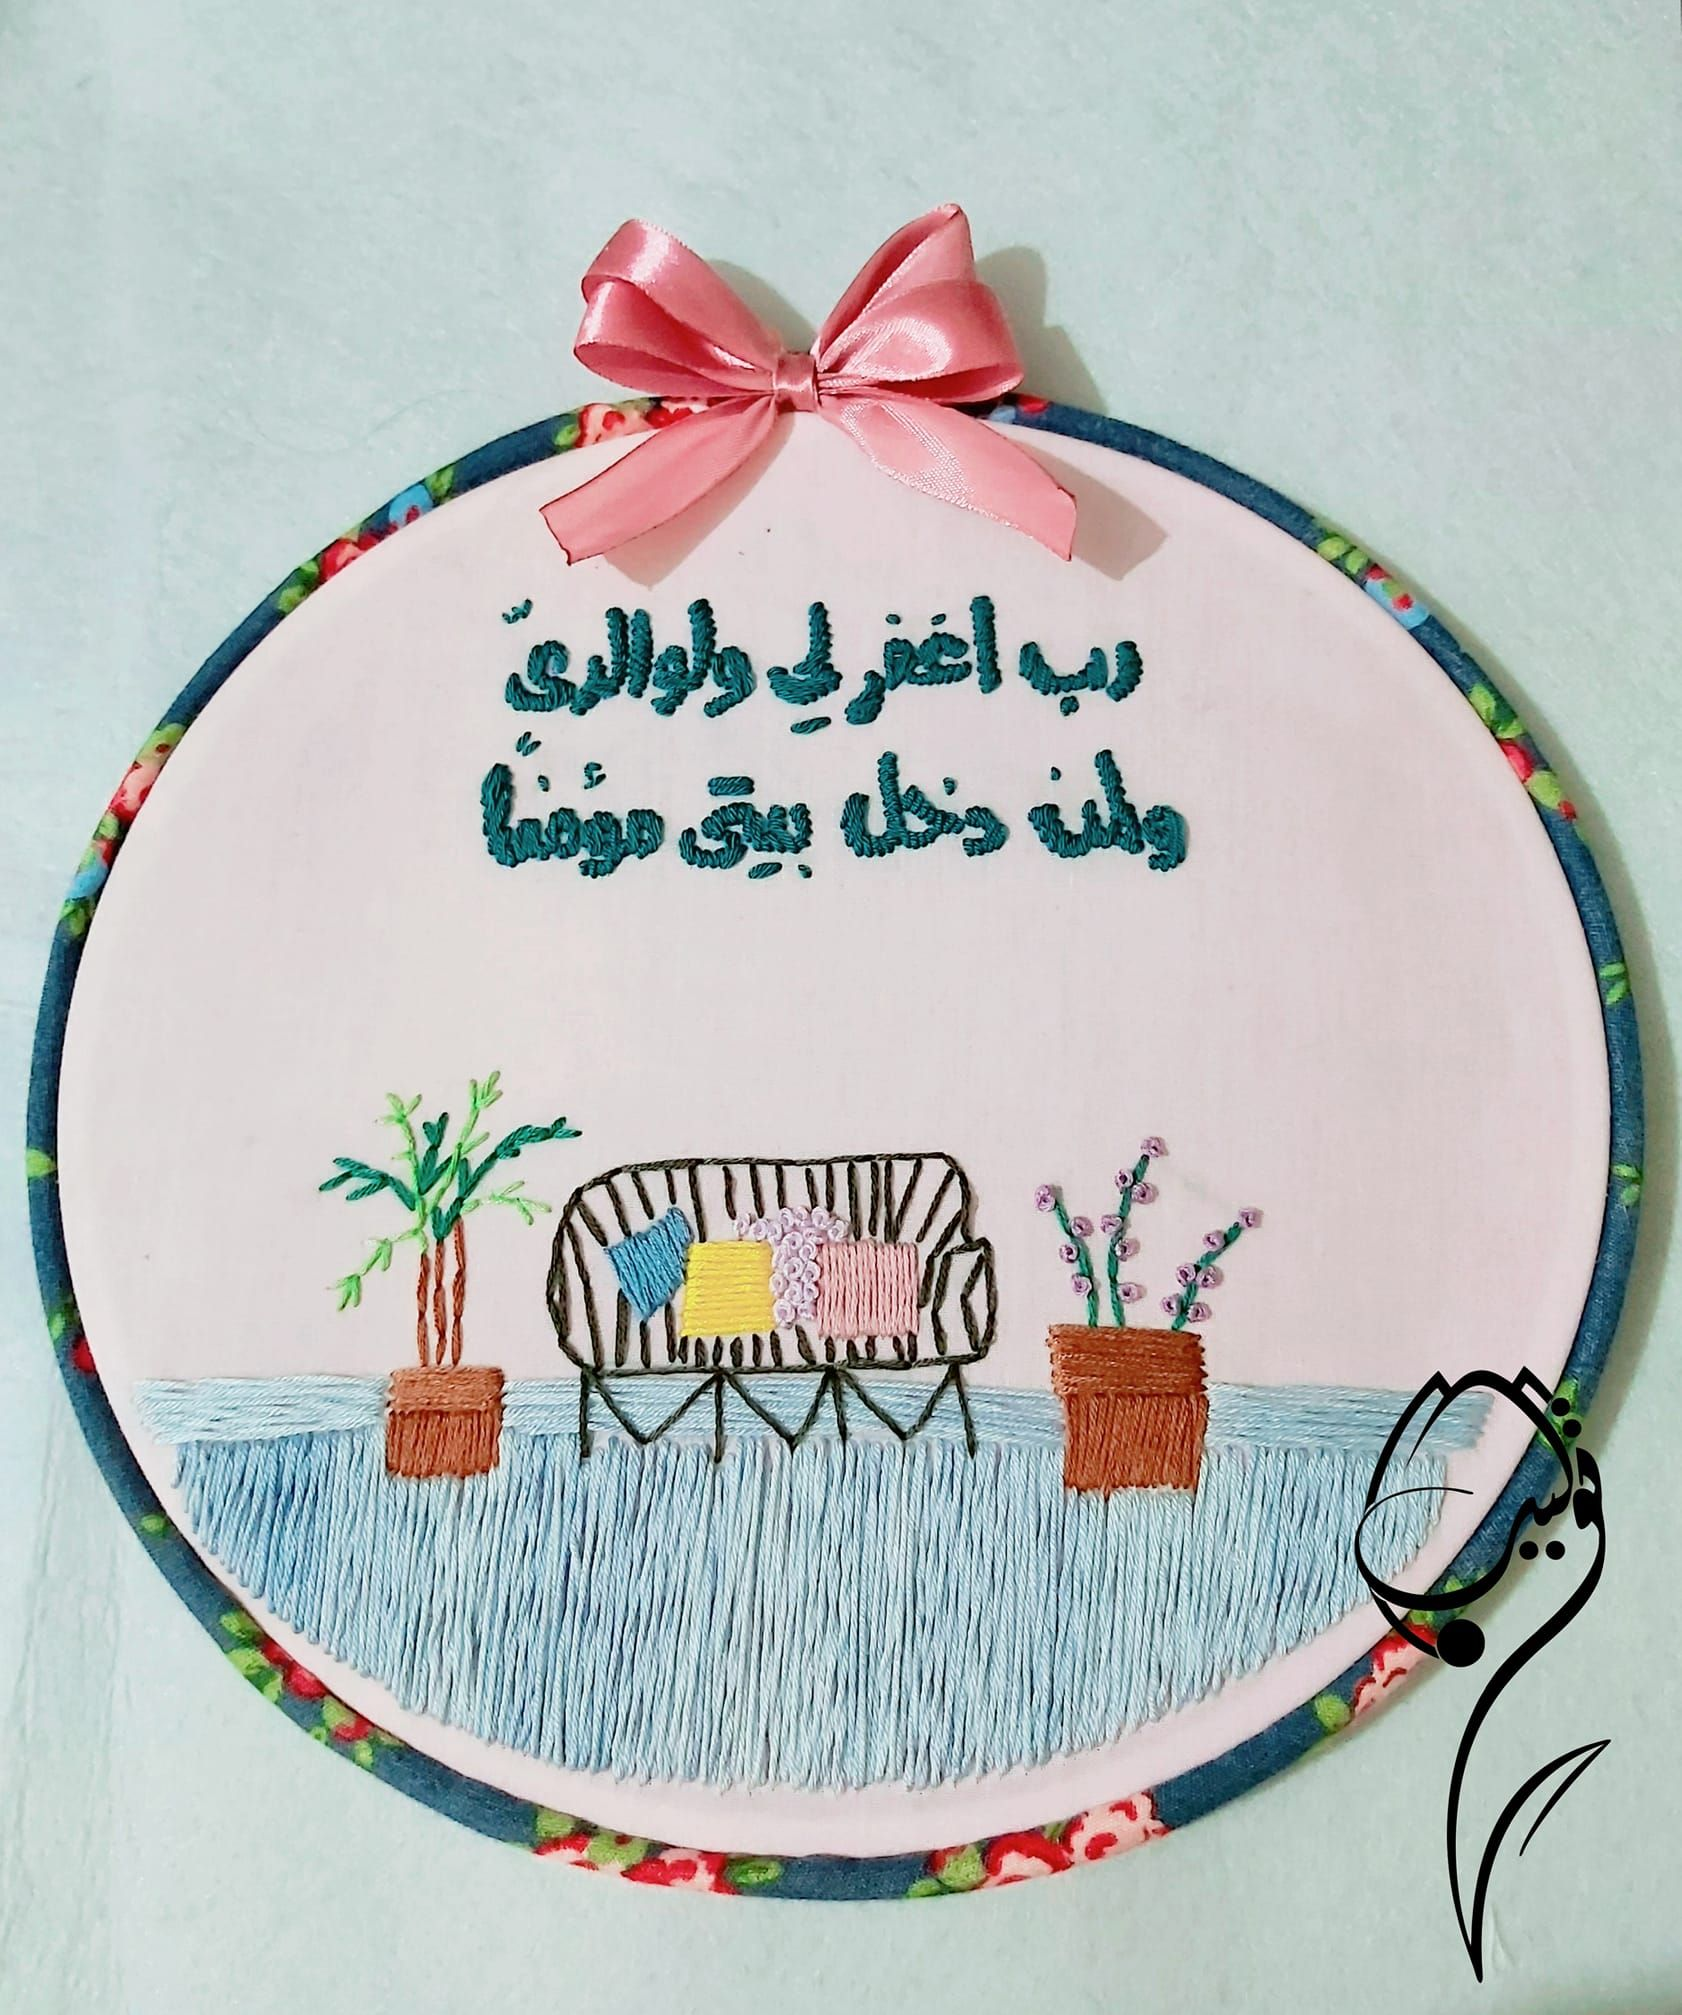 Pin By Heba Ramadan On بيتنا Hand Embroidery Videos Hand Embroidery Designs Embroidery Patterns Free